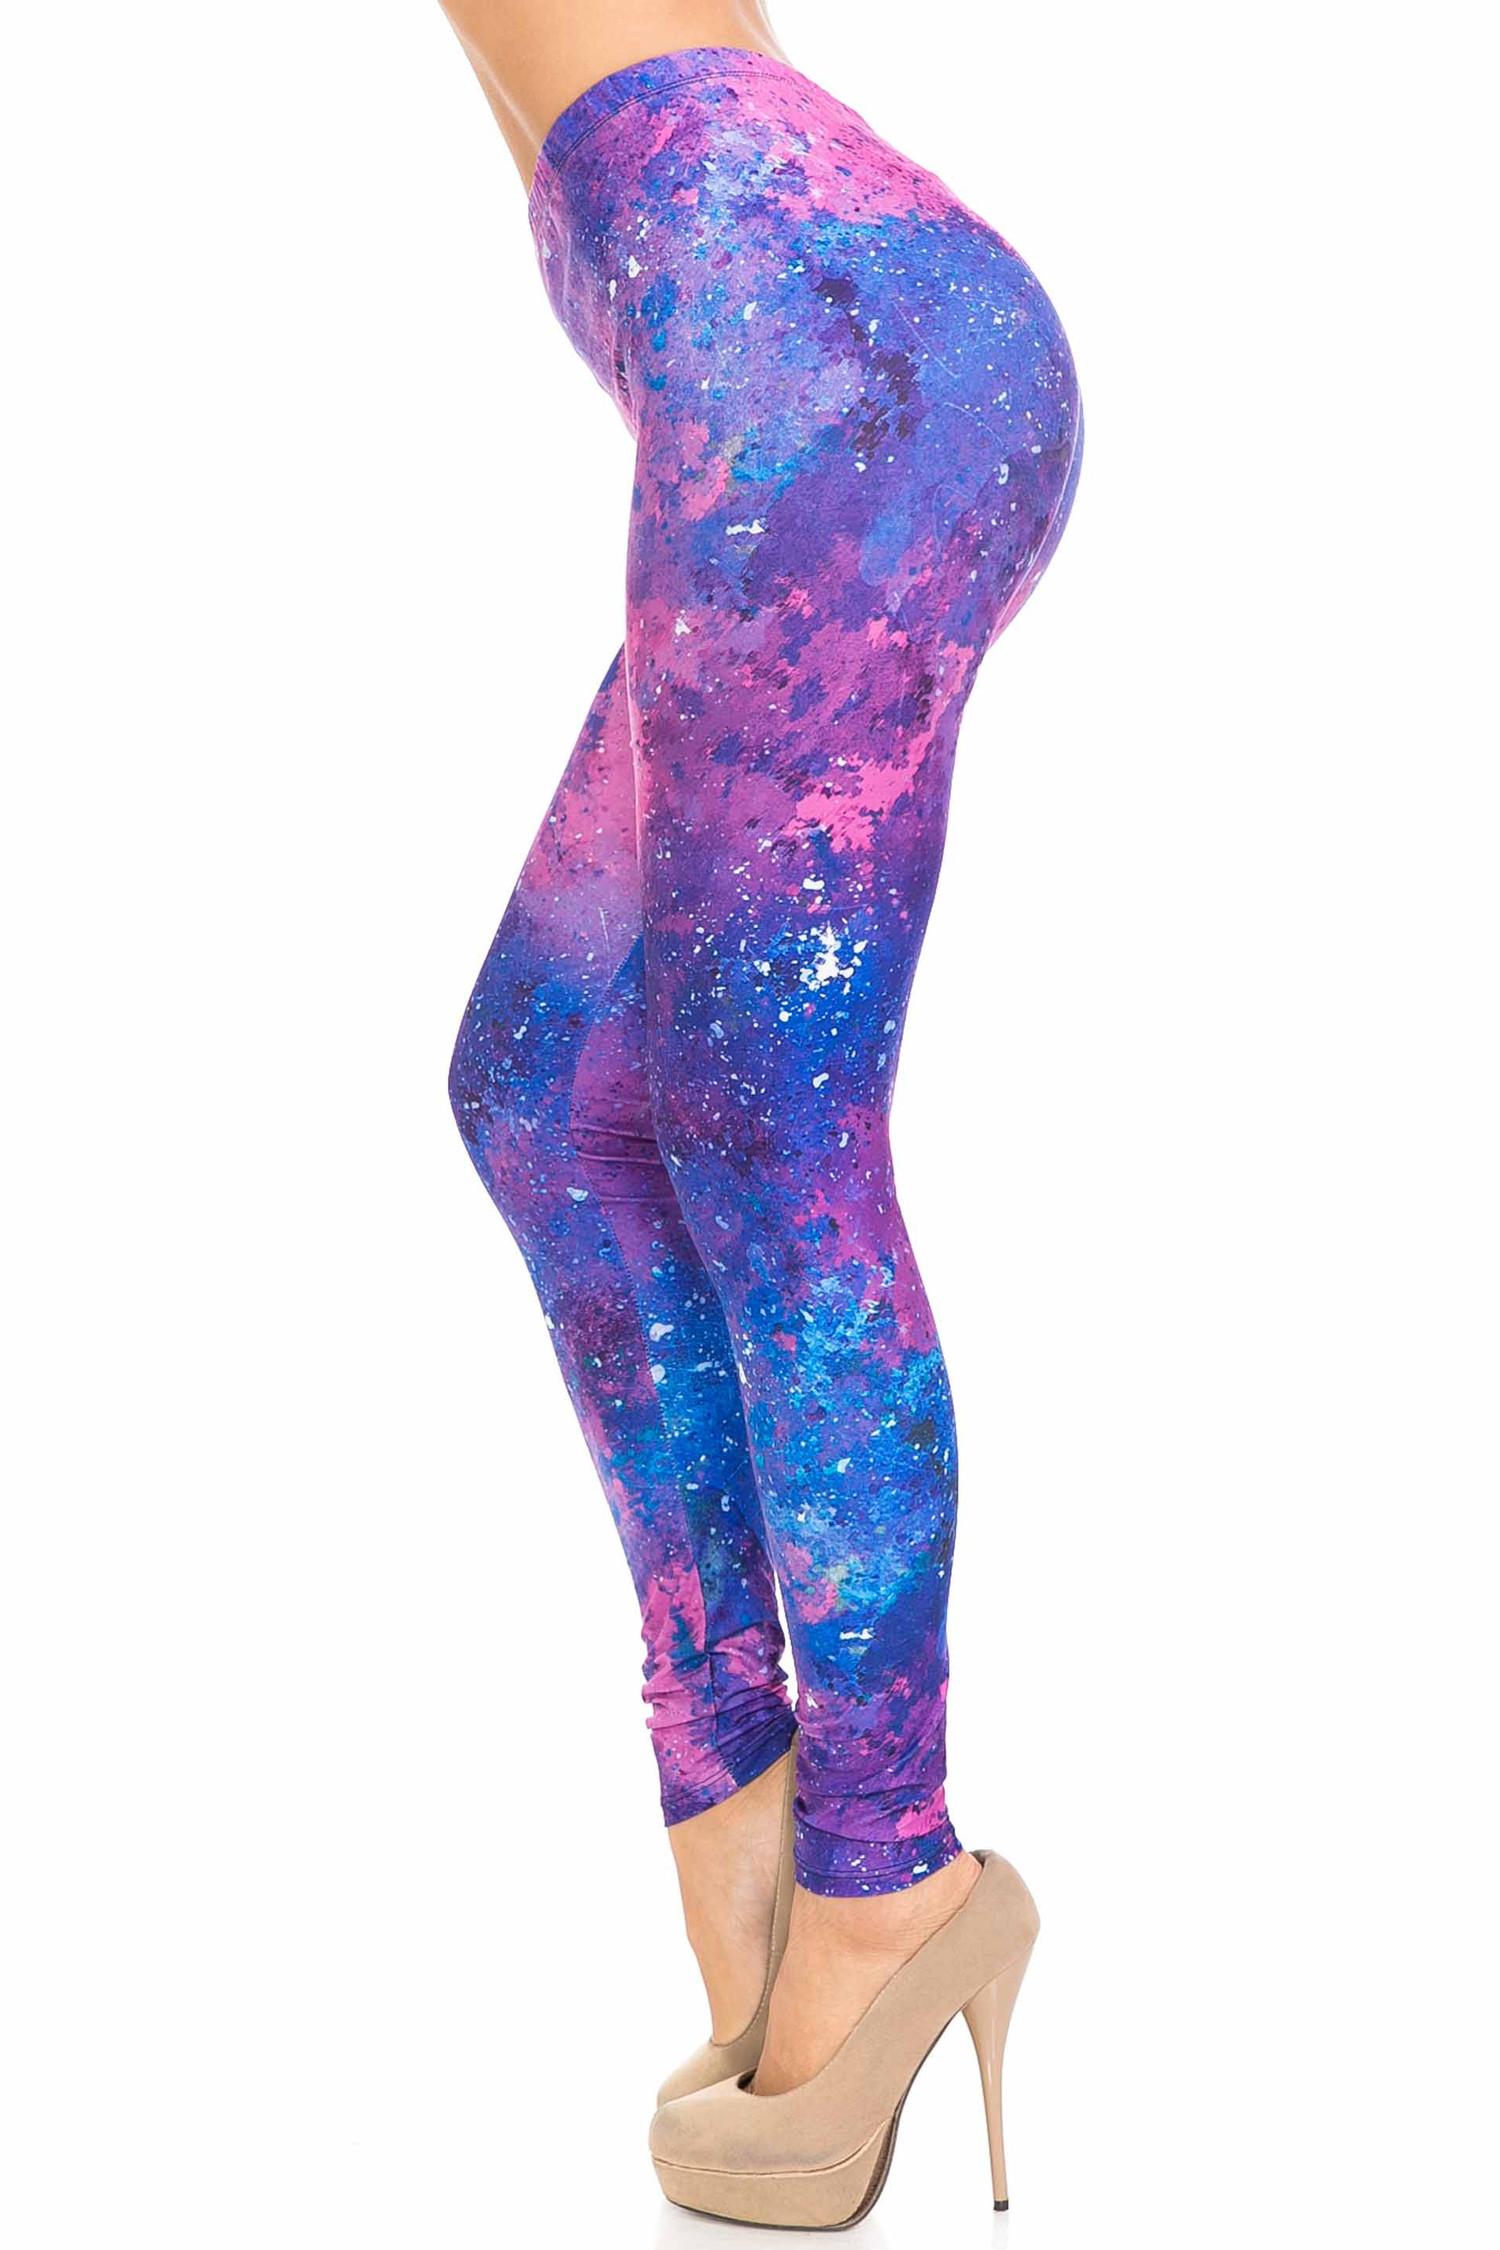 Left side image of Creamy Soft Blue Fuchsia Nebula Plus Size Leggings - USA Fashion™